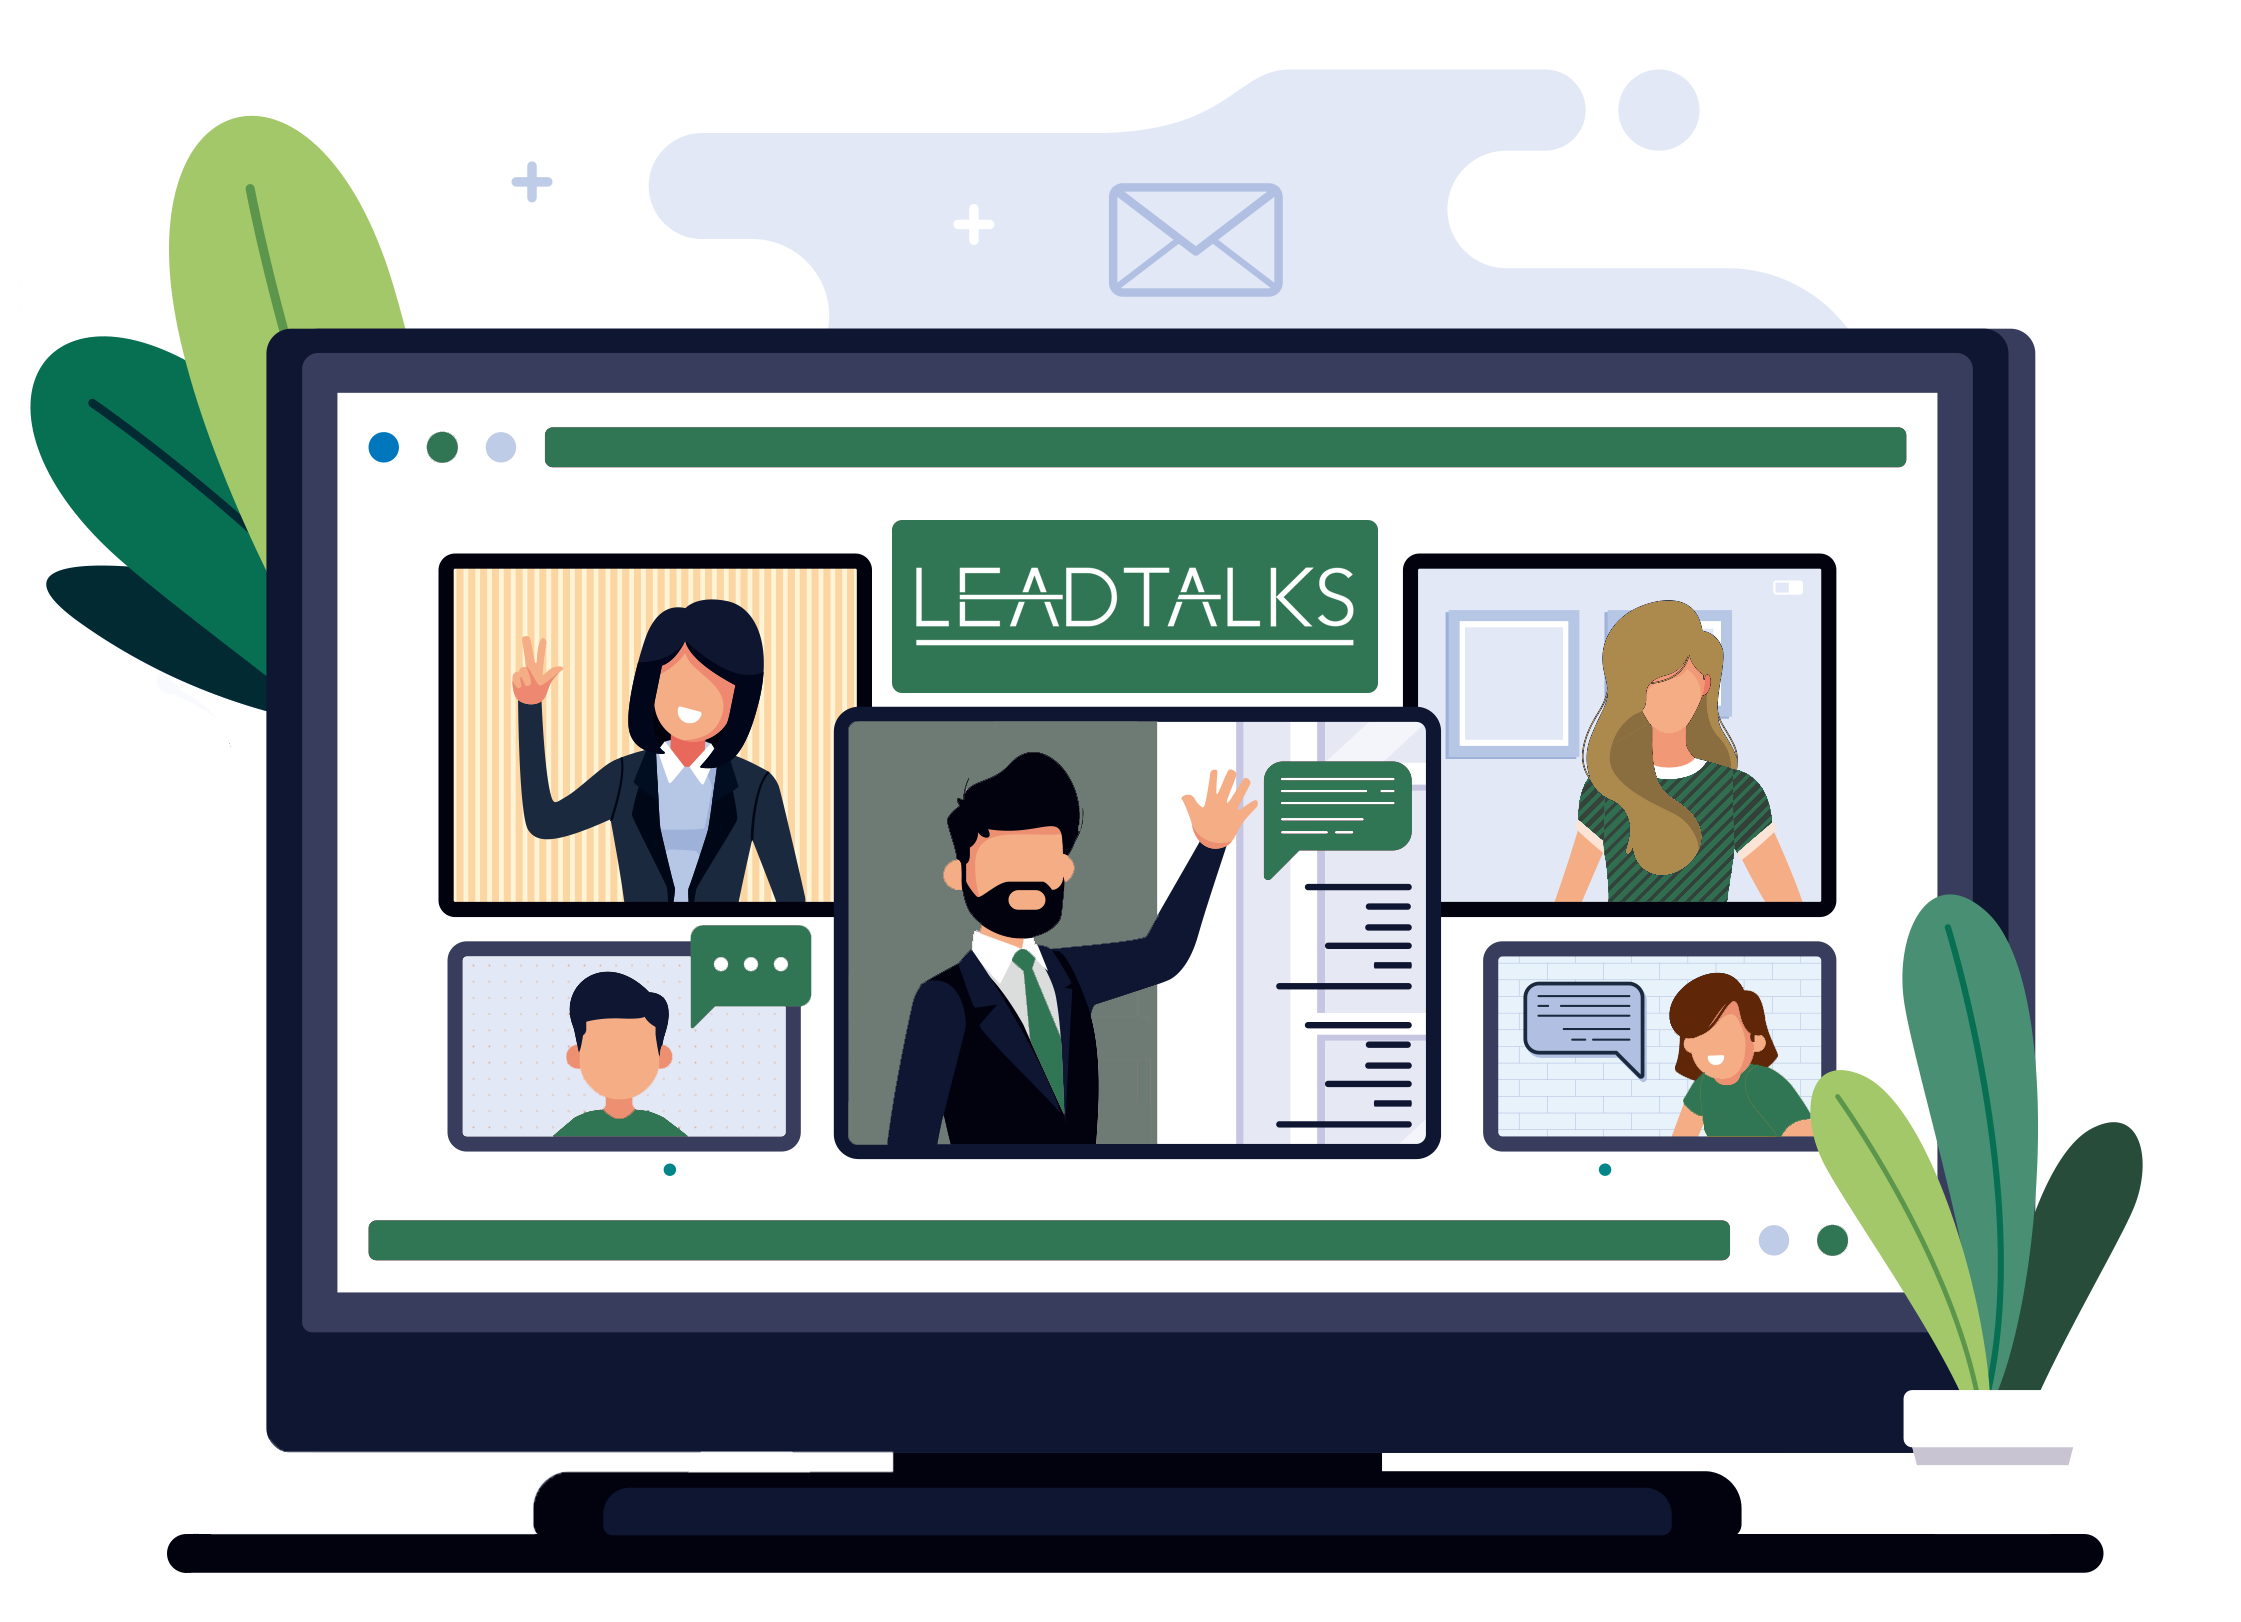 LeadTalks Graphic V2